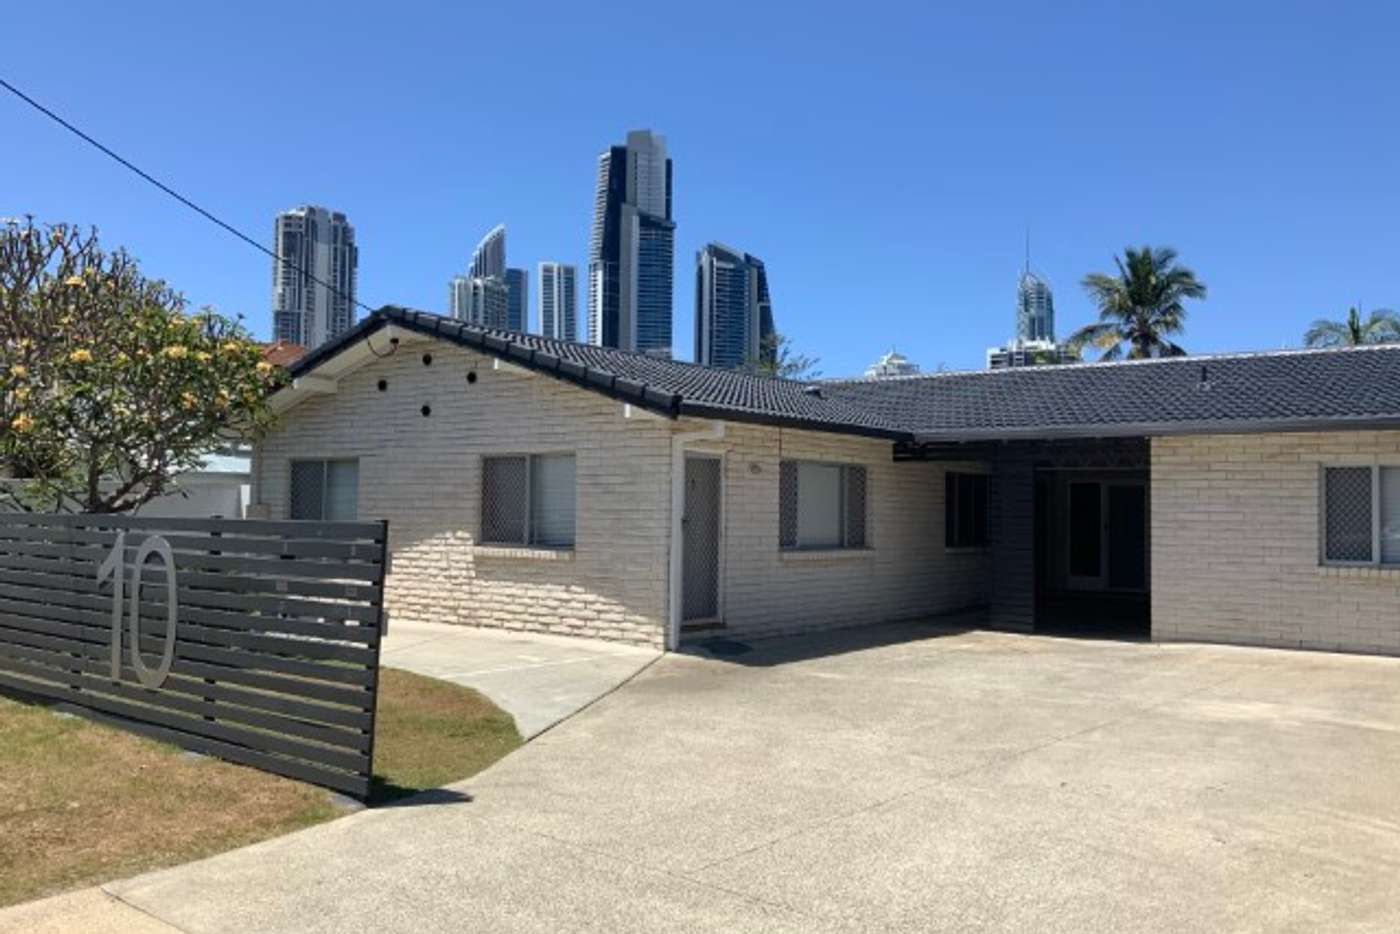 Main view of Homely unit listing, 2/10 Adori Street, Chevron Island QLD 4217